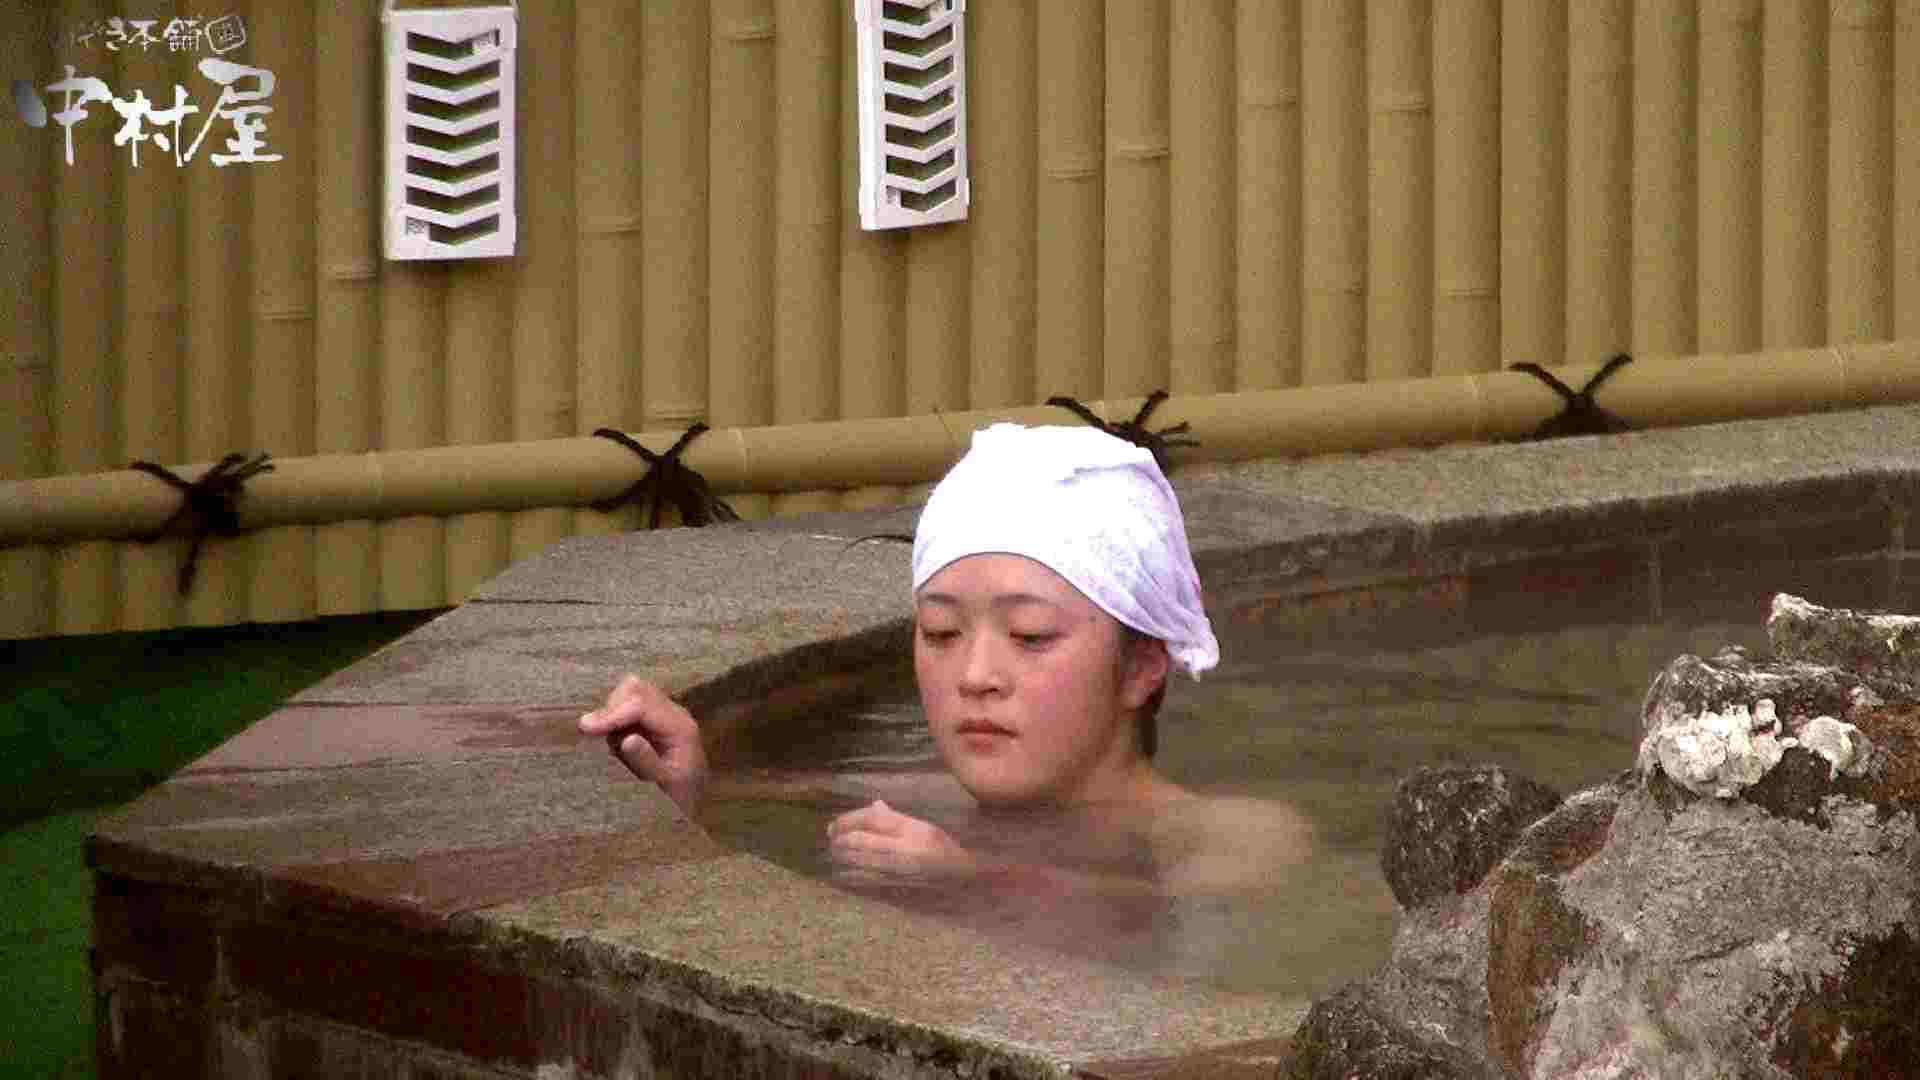 Aquaな露天風呂Vol.920 盗撮シリーズ | 露天風呂編  89PIX 17